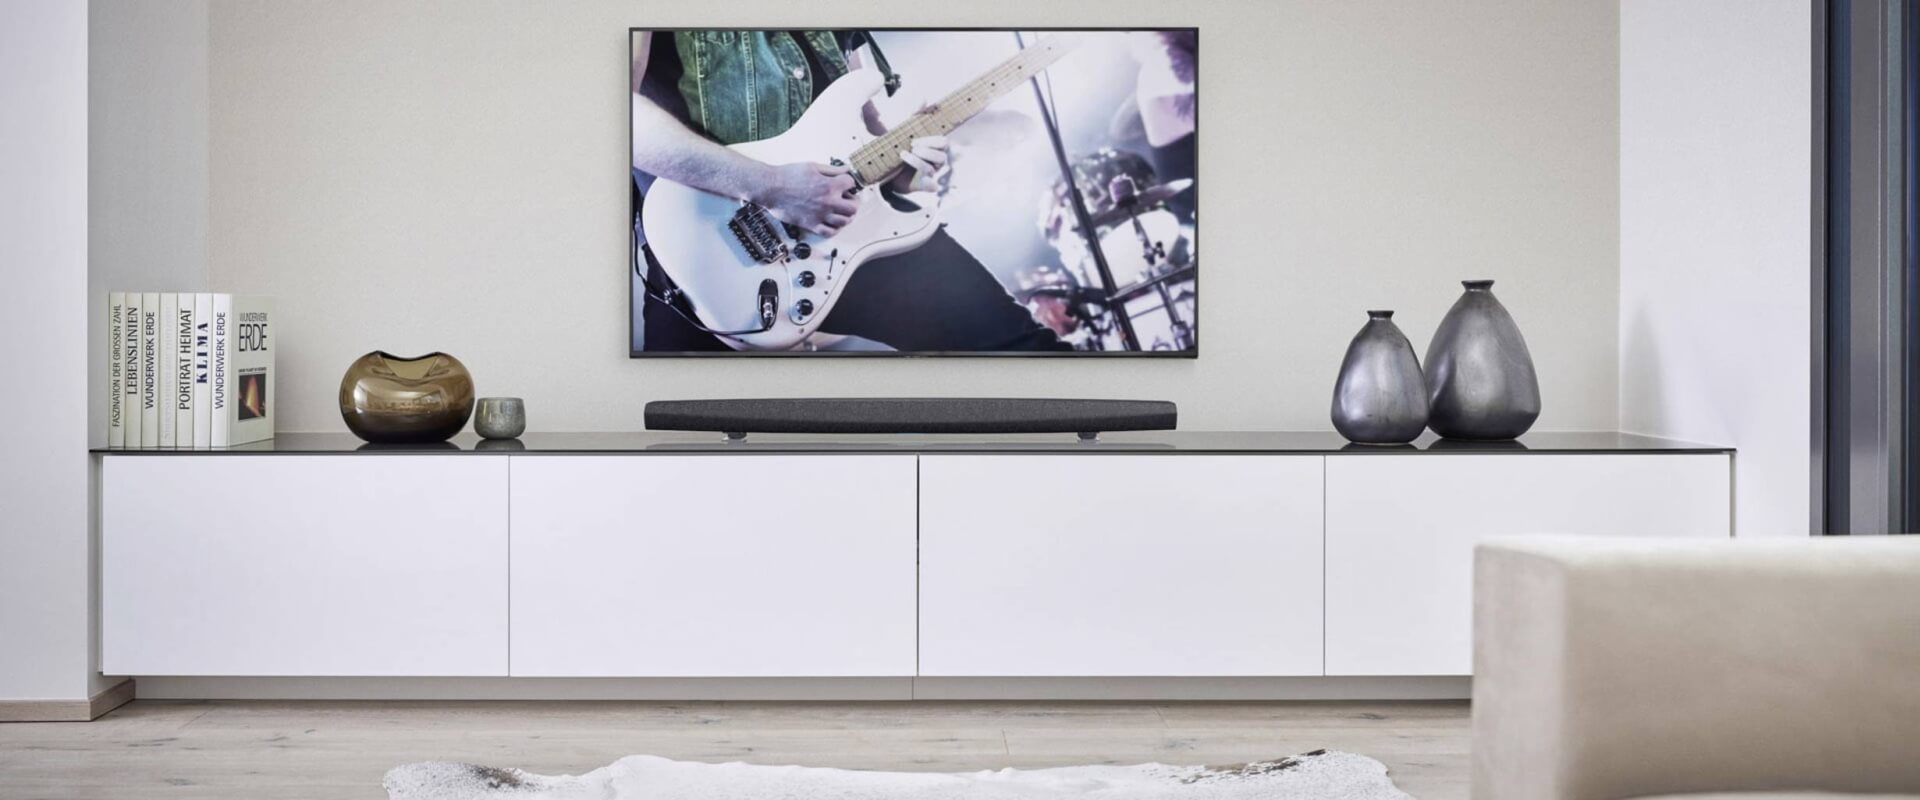 Denon_Heos_TV_Soundbar_Heimkino-de